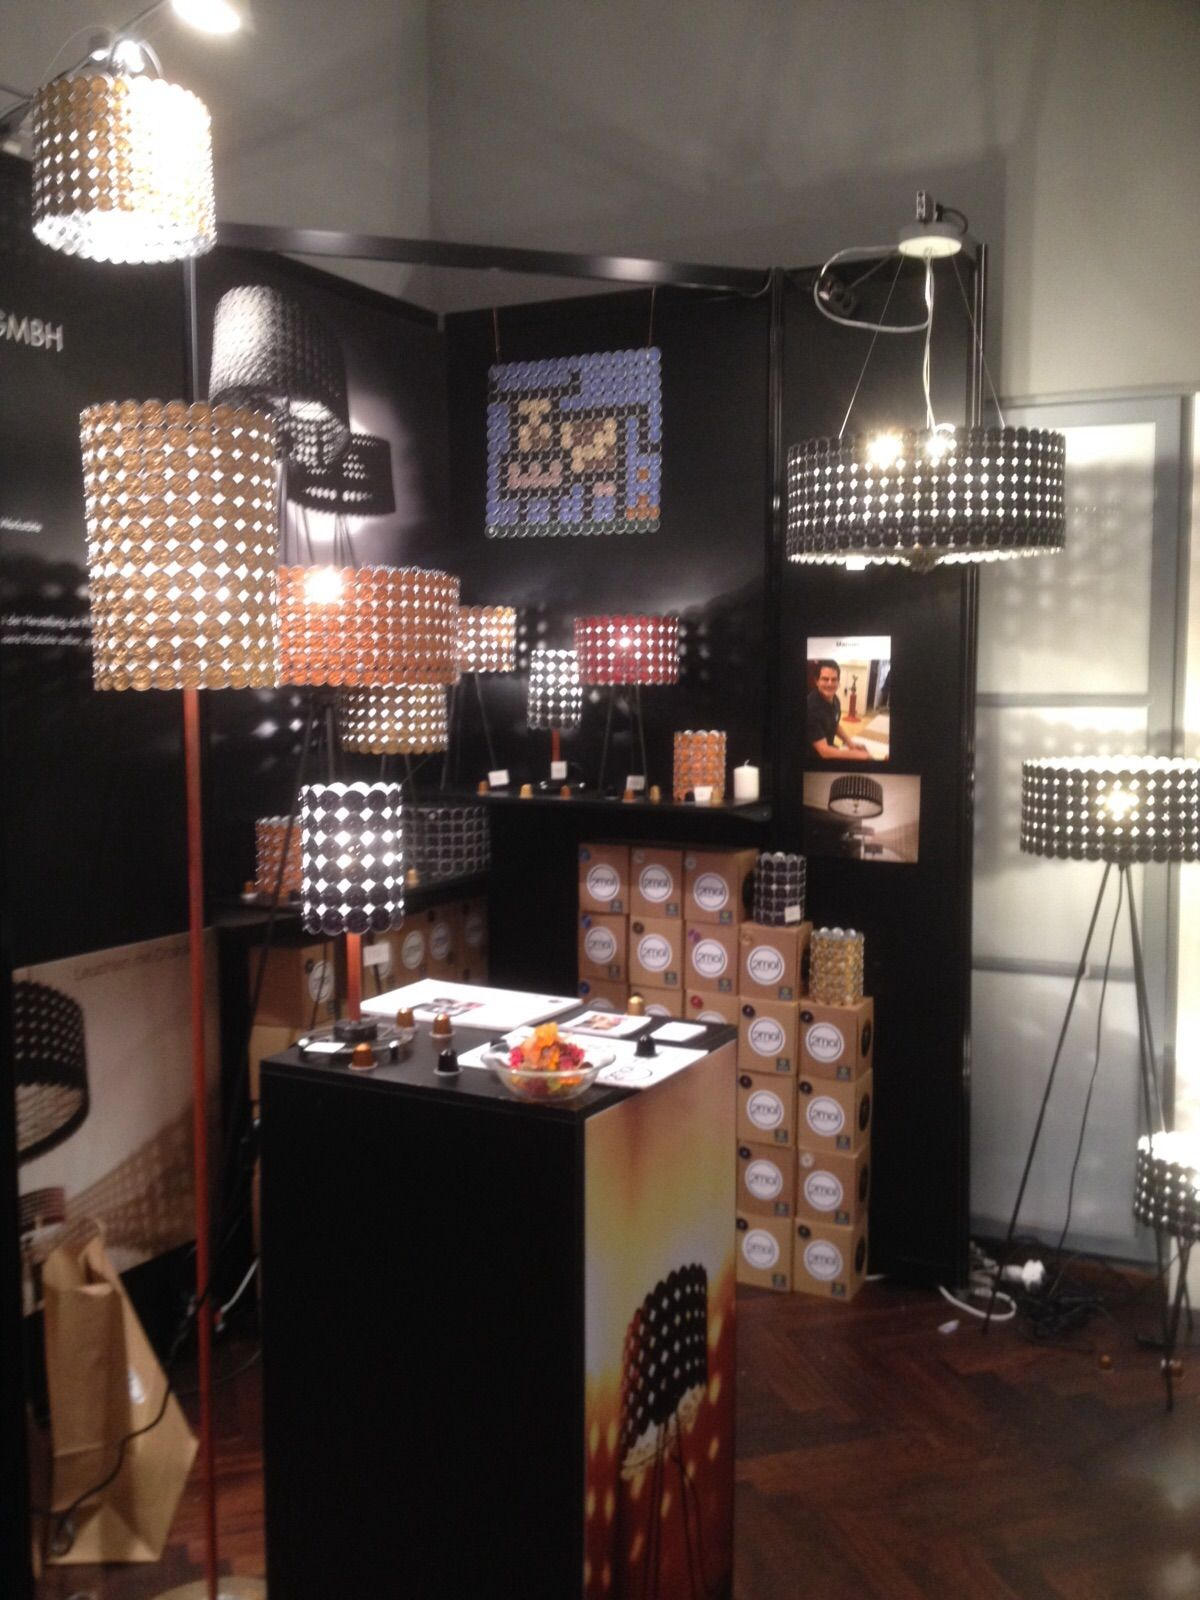 Kommt Vorbei Uns Trefft Uns Personlicht An Der Designgut In Winterthur Wir Freuen Uns Auf Euch Designgut2015 2mol Design Home Decor Decor Liquor Cabinet